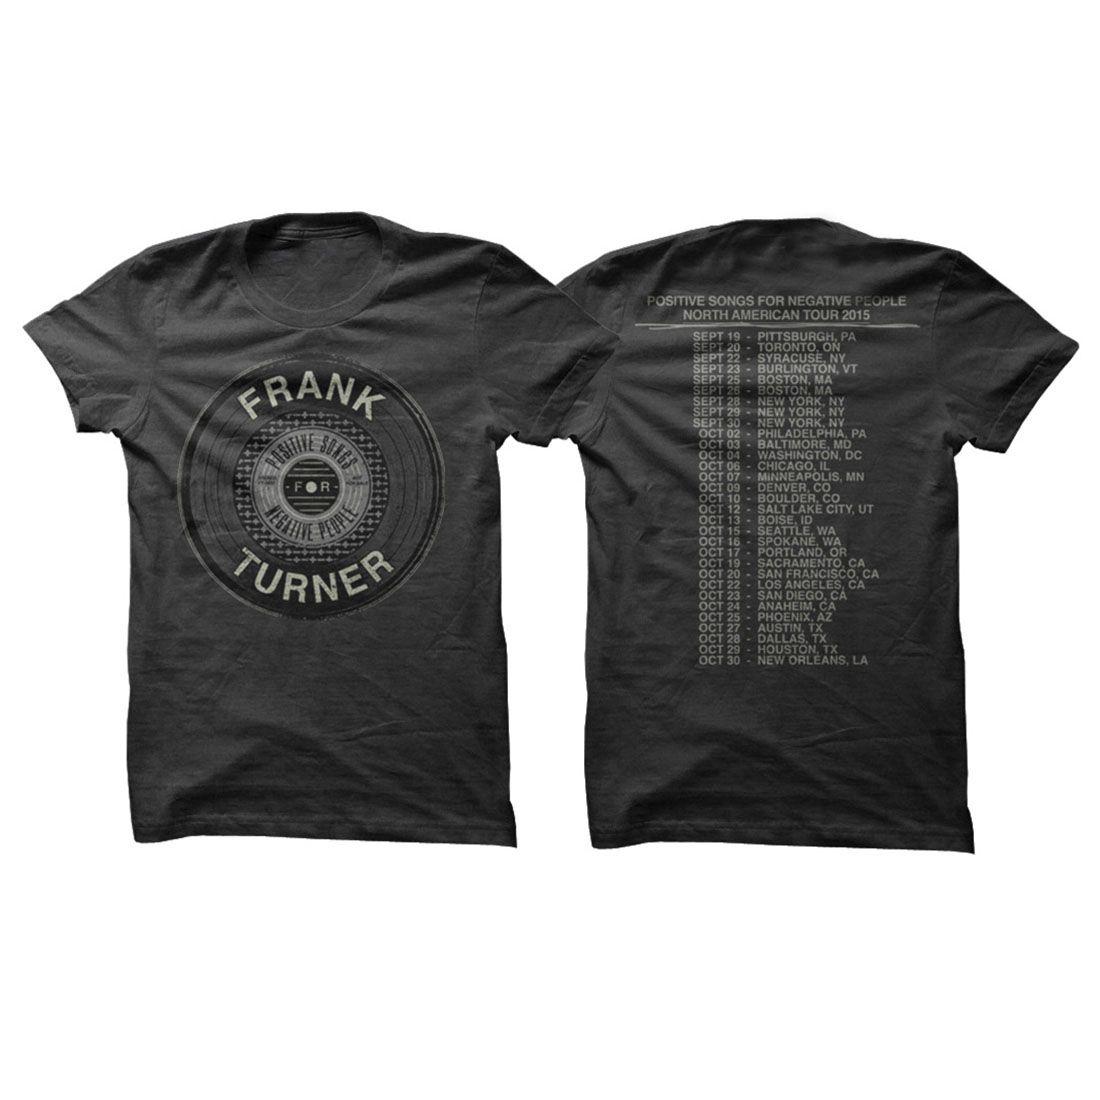 Frank Turner Vinyl Tour T-Shirt